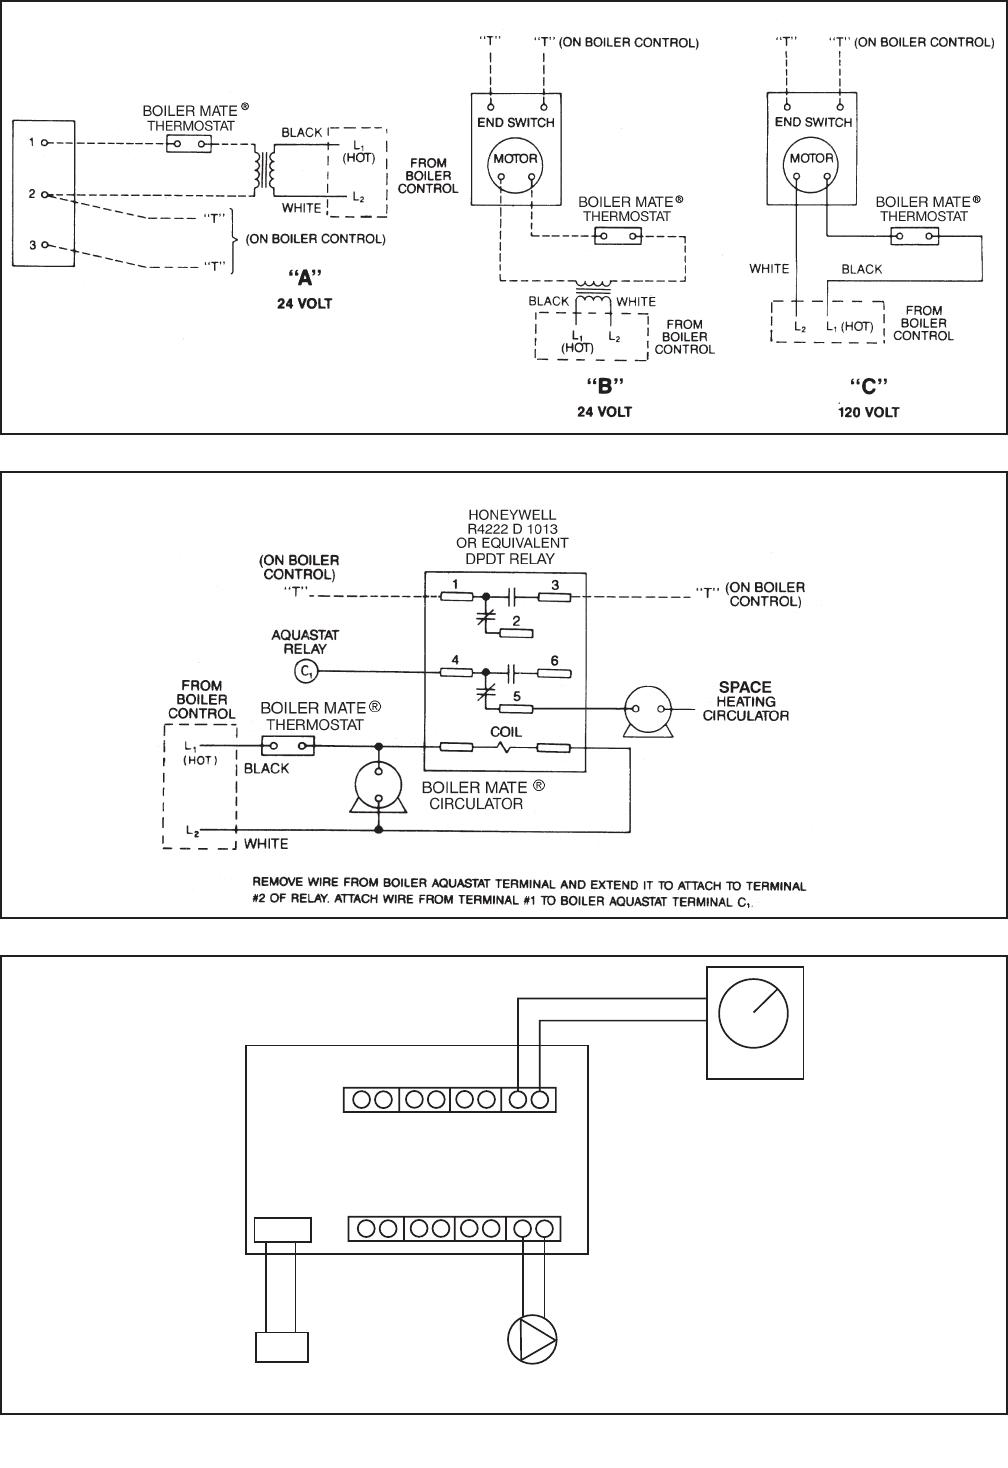 Amtrol smart control manual